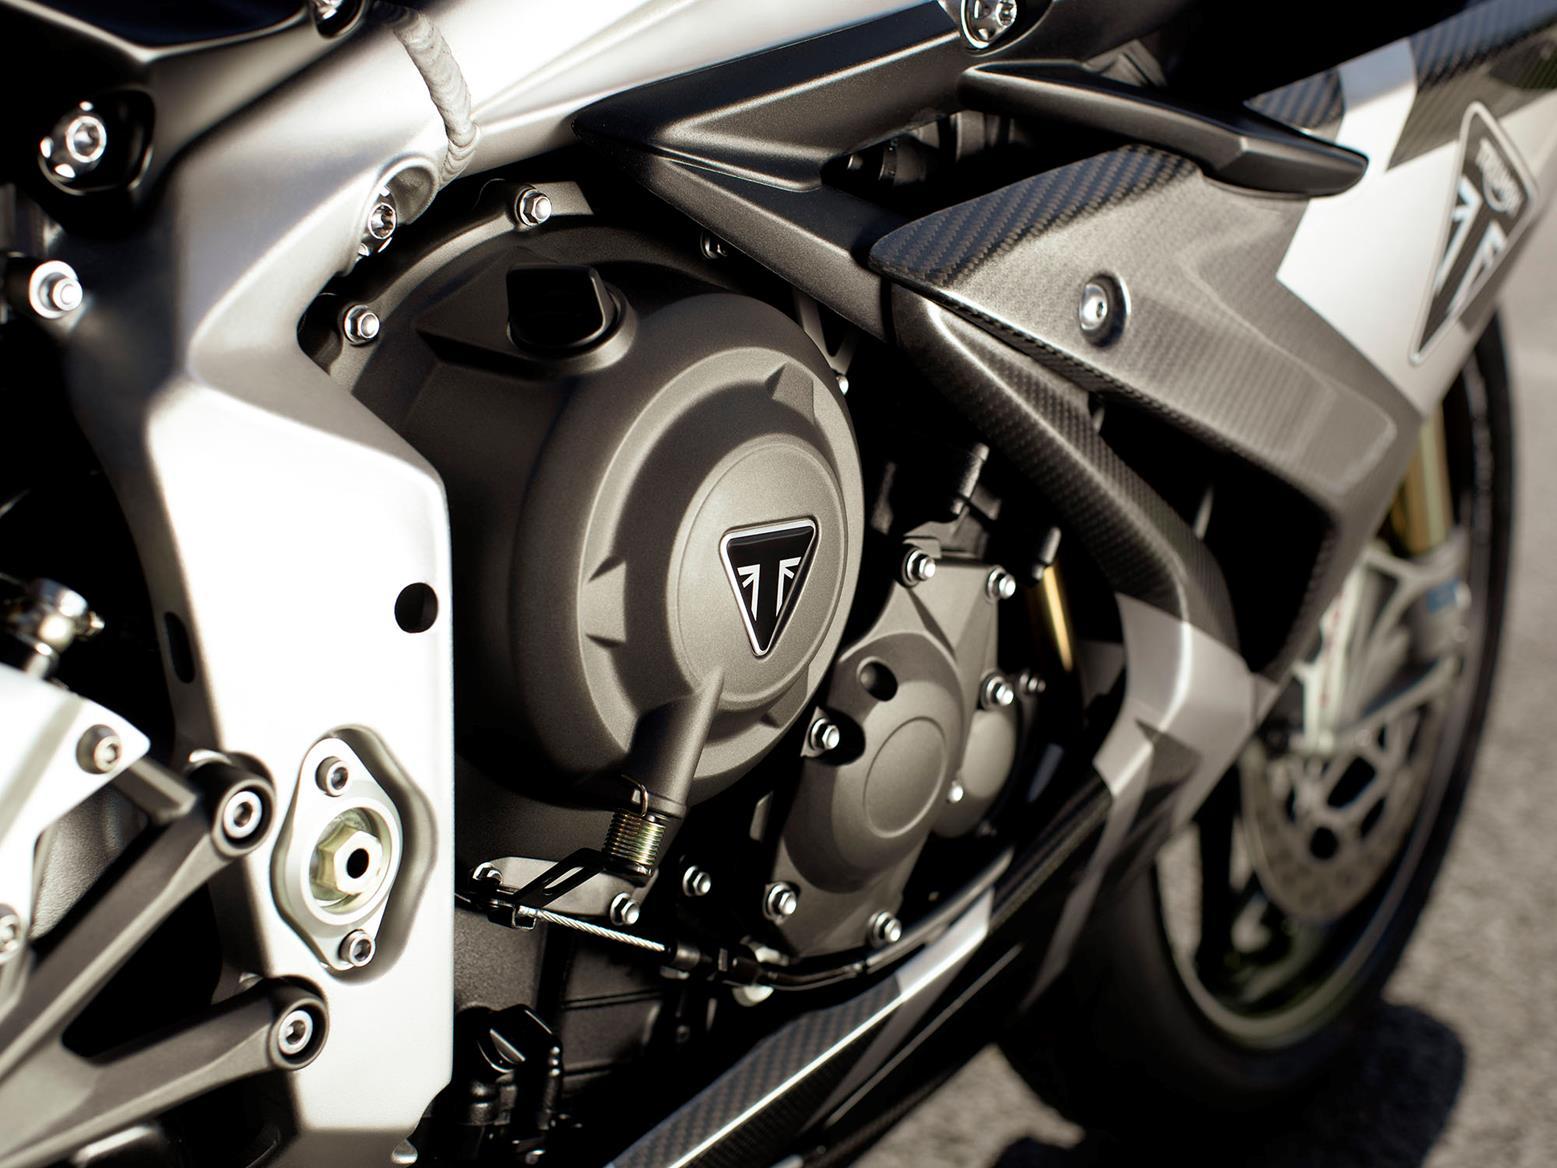 Triumph Daytona 765 Moto2 engine